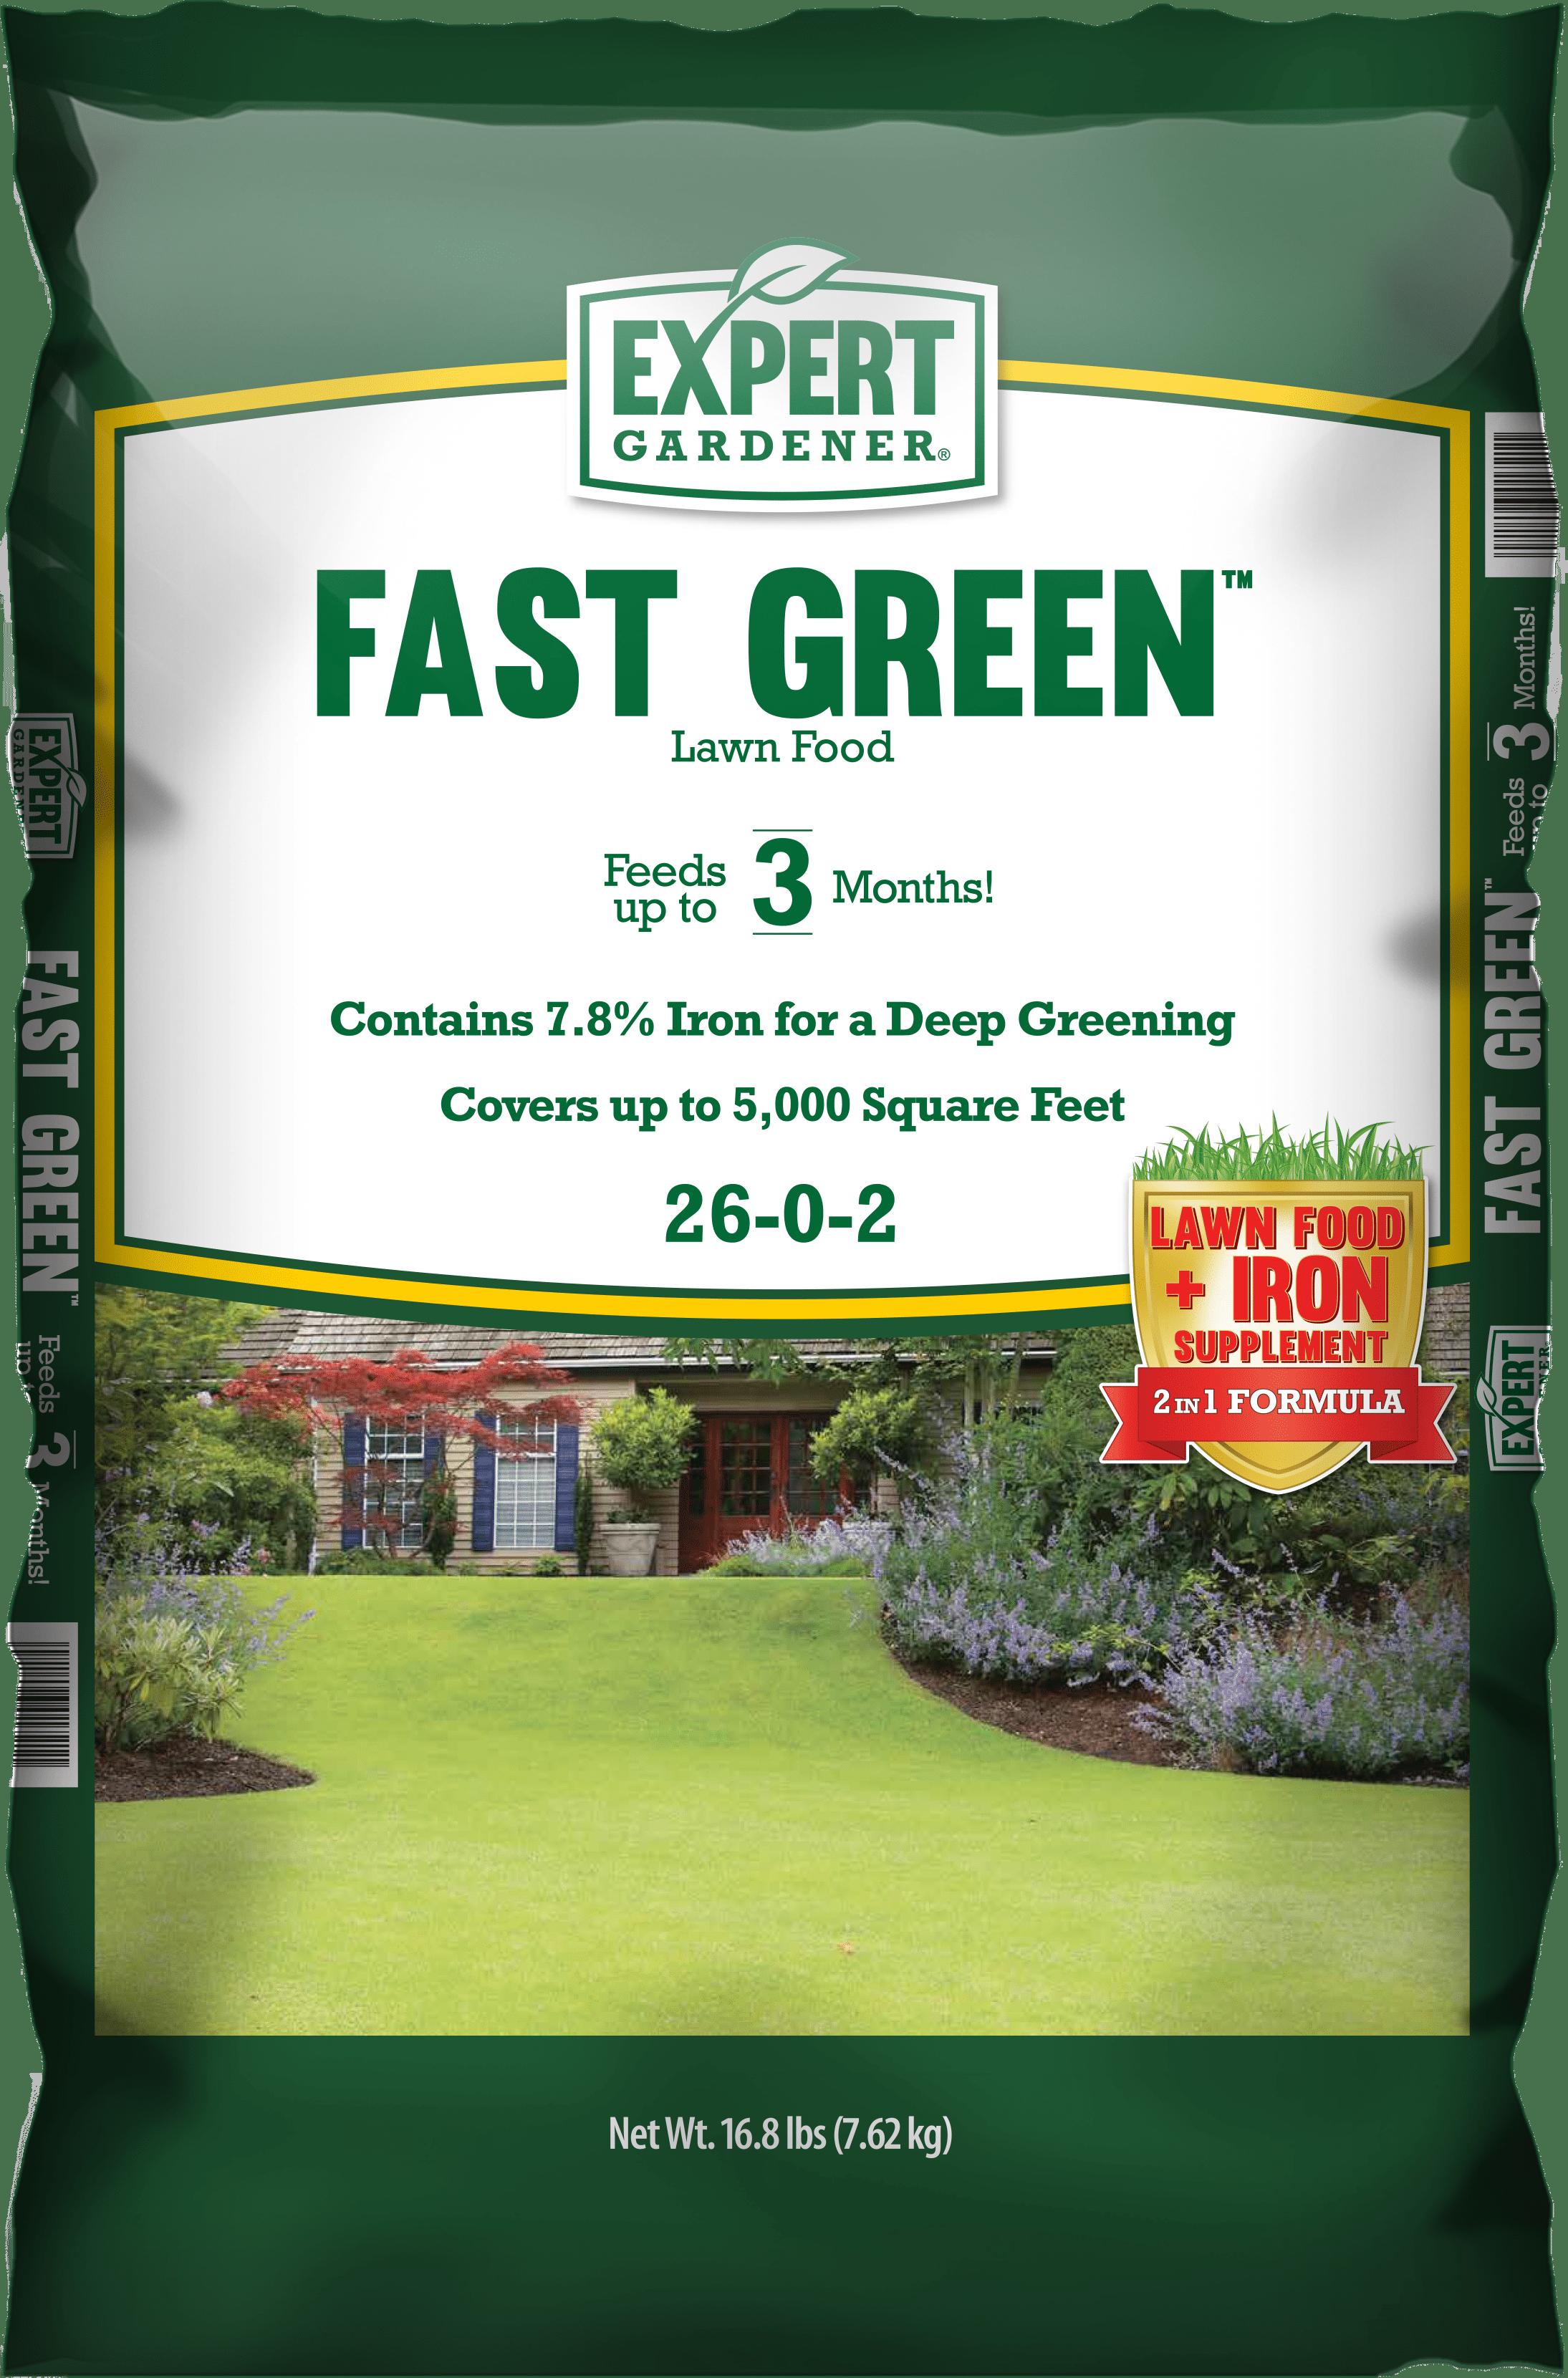 expert gardener lawn fertilizer fast green lawn food 26-0-2, covers 5,000  square feet